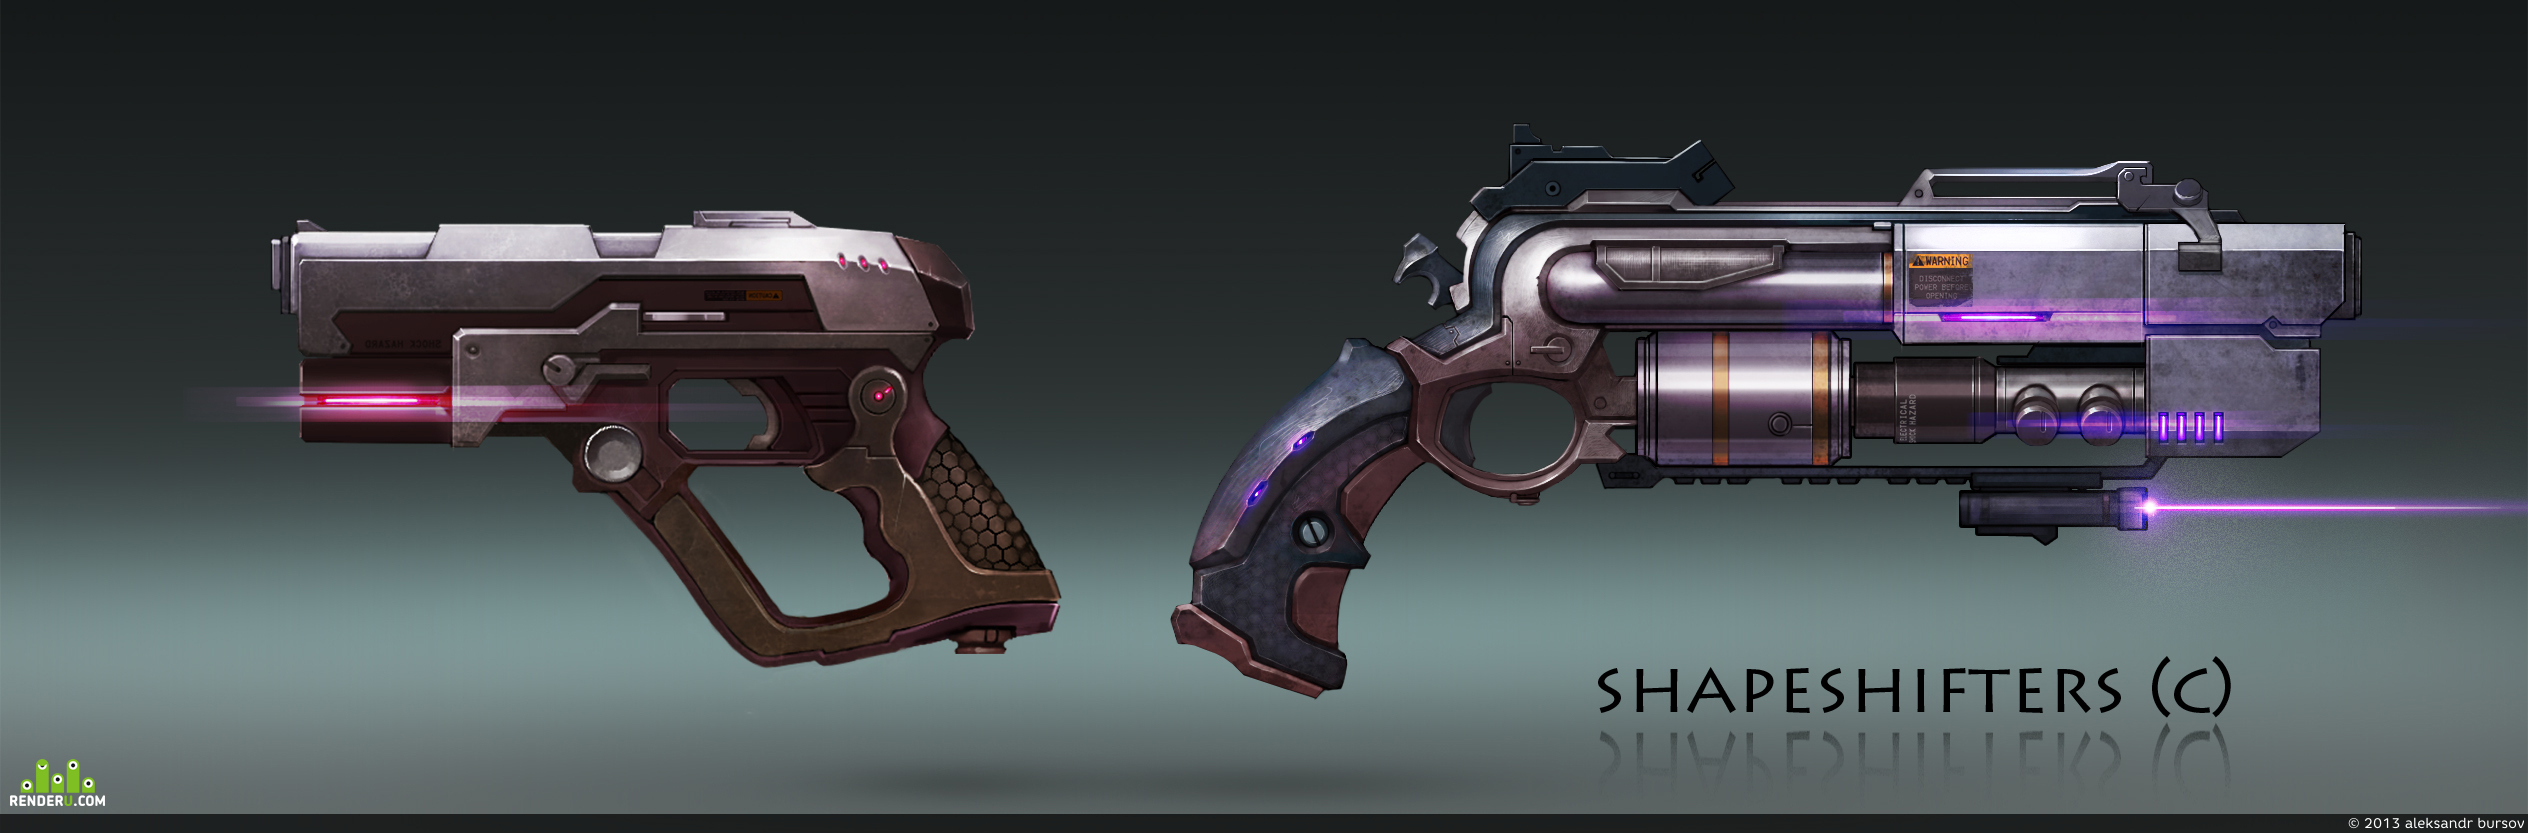 preview pistols